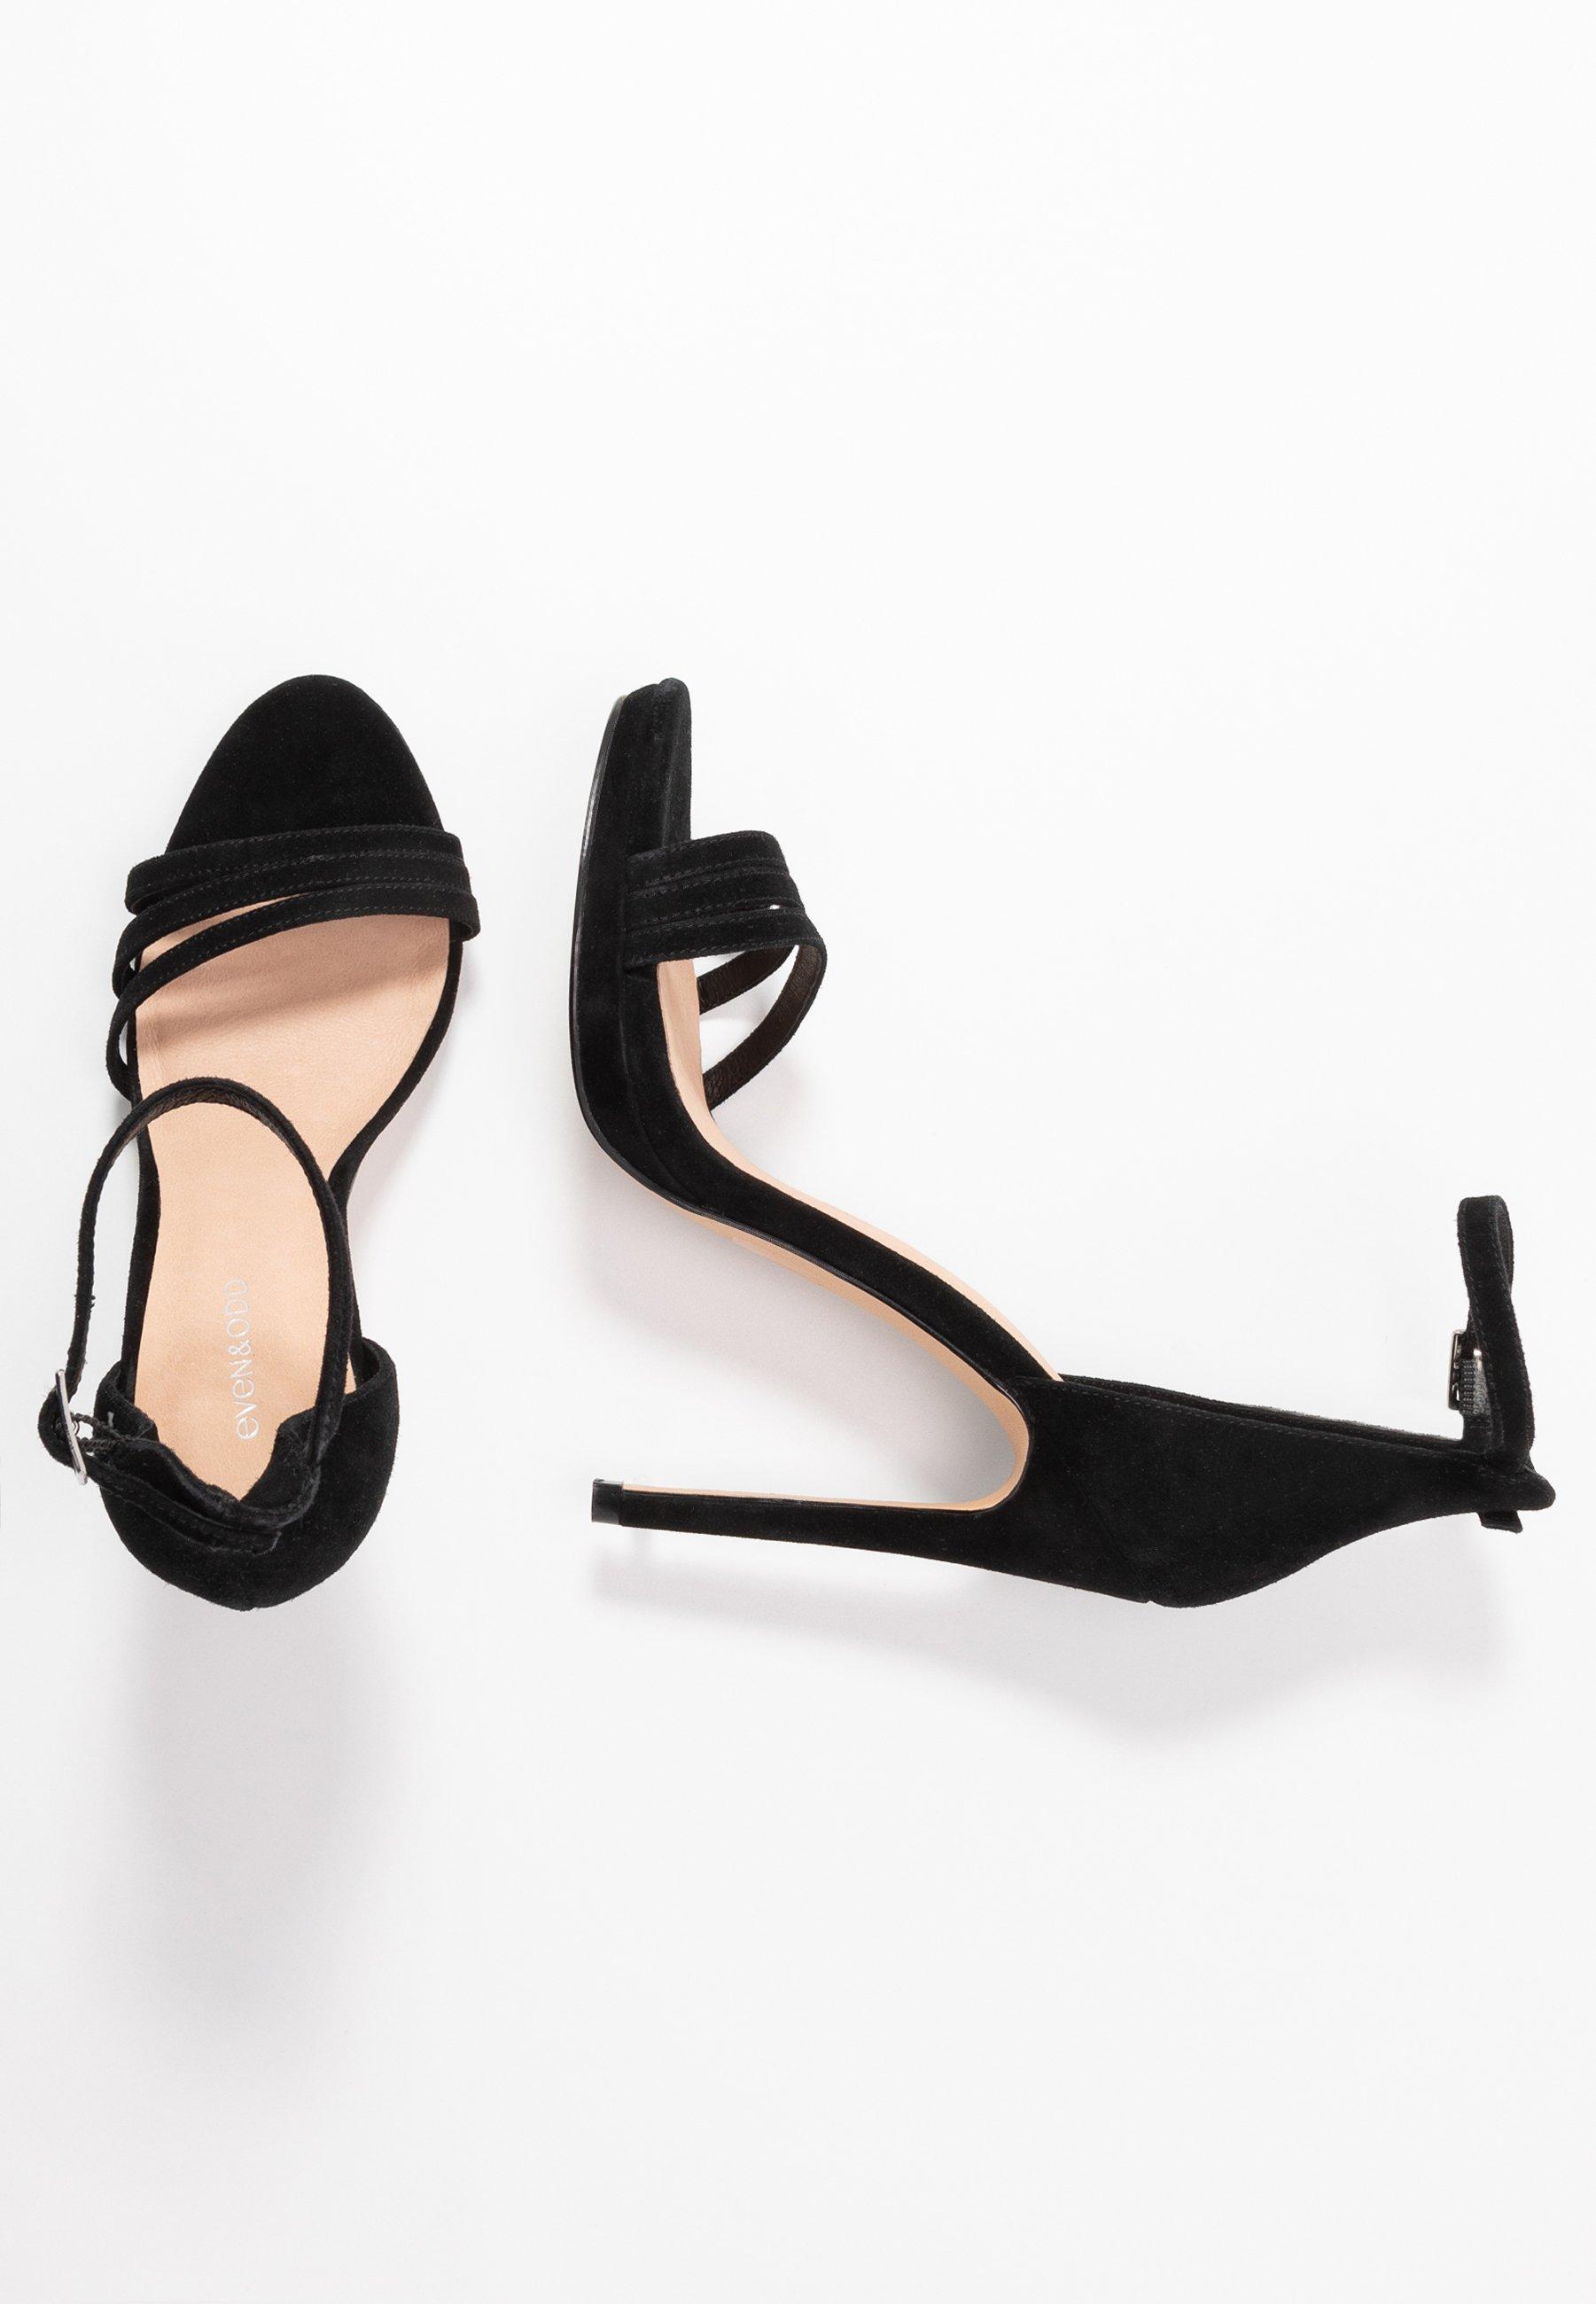 Even&odd Leather - High Heeled Sandals Black